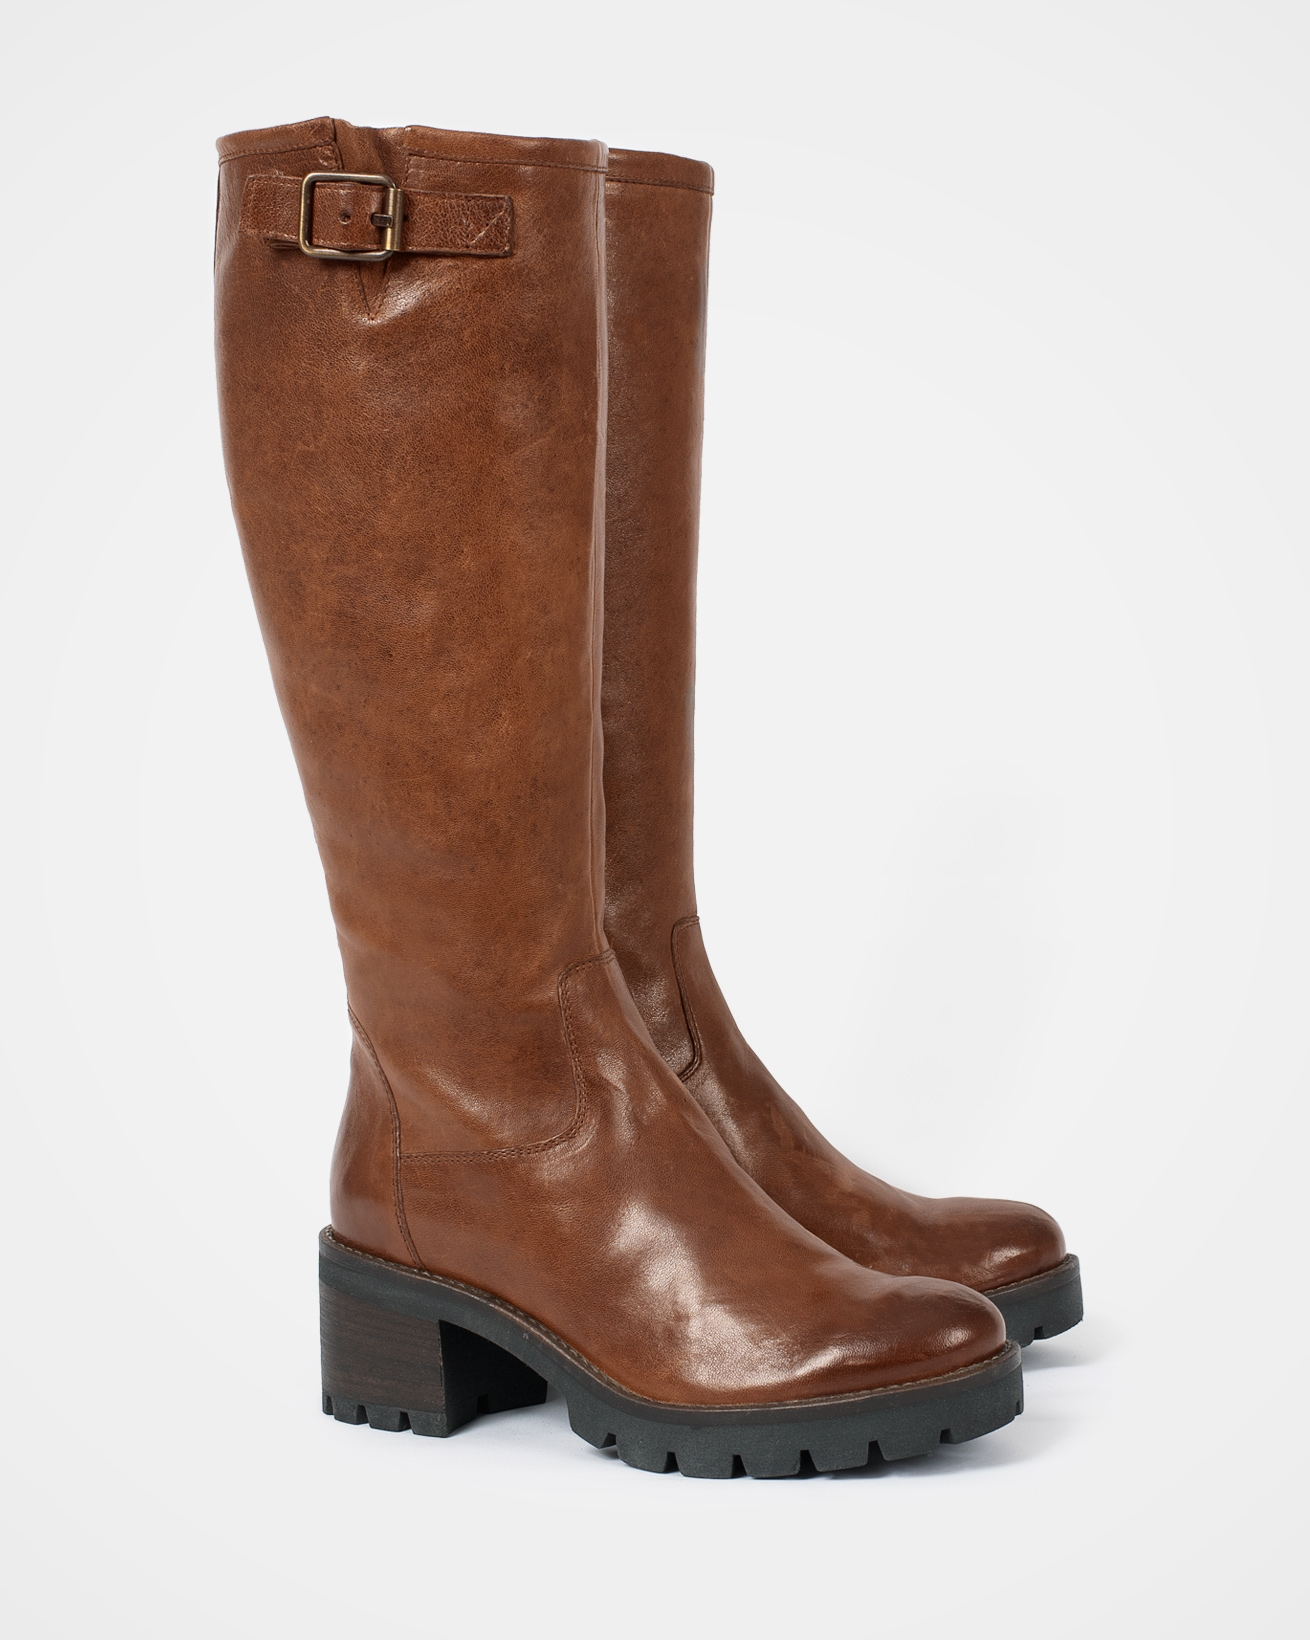 Biker boot - Size 39 - Antique Brown - 1467